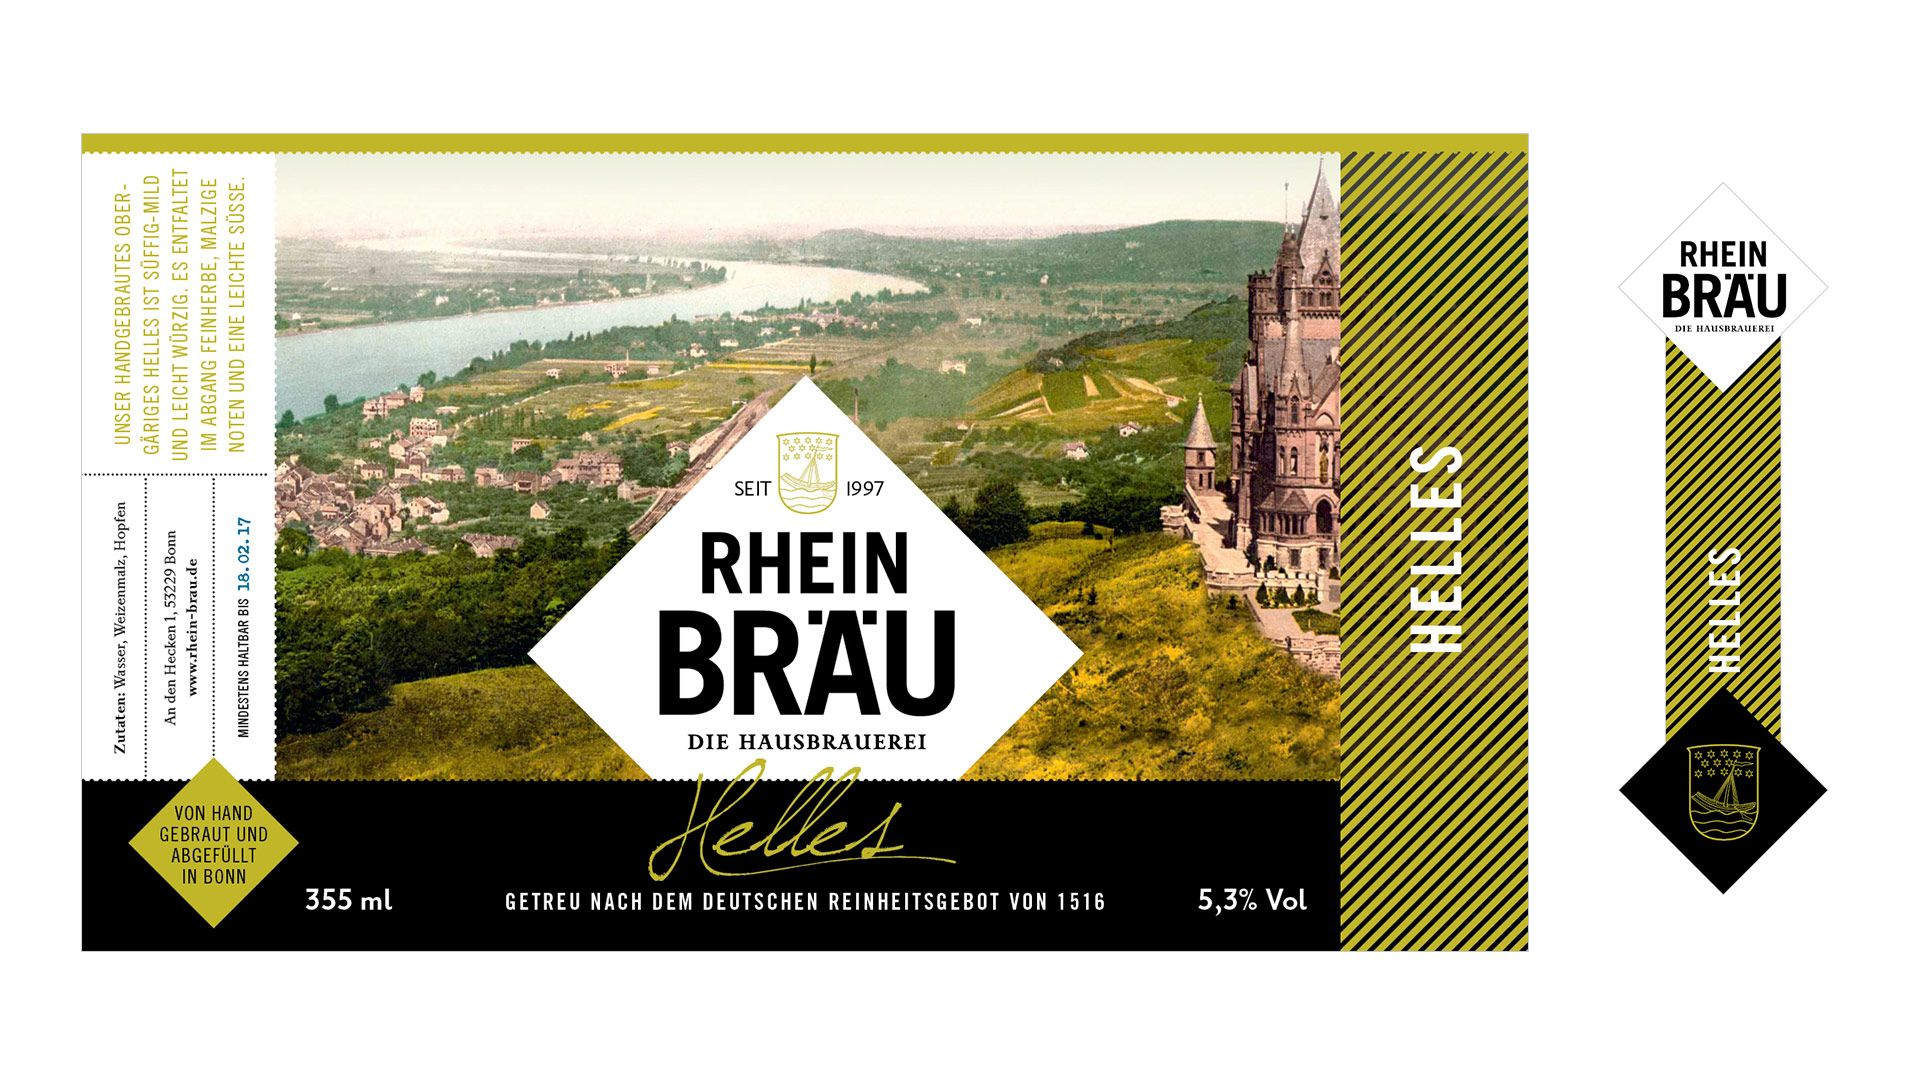 Rhein Bräu - Helles